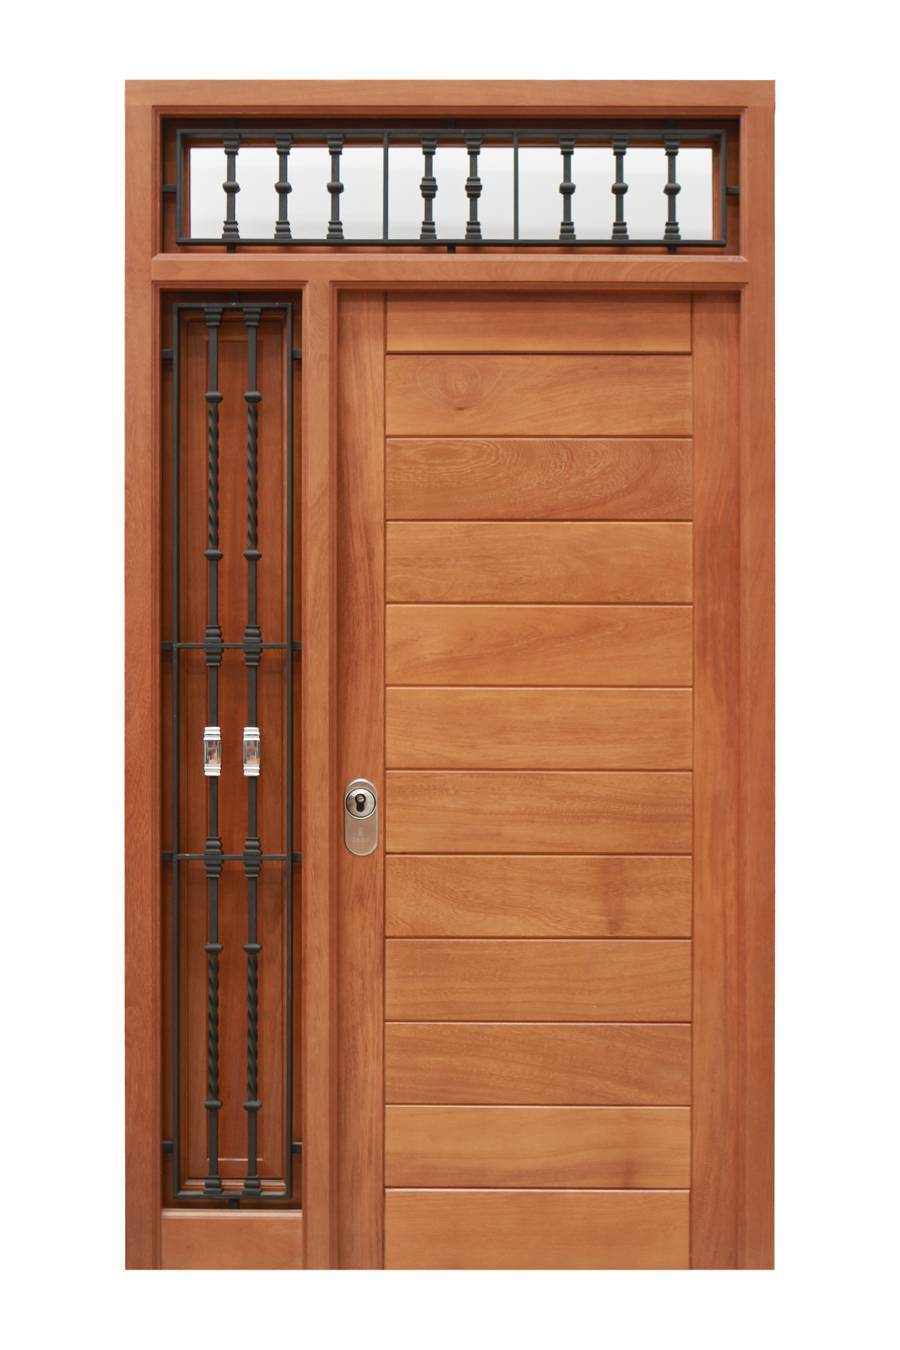 Puerta de calle de madera moderna MARCO Nº 5+HOJA P 2 - Puertas Cano